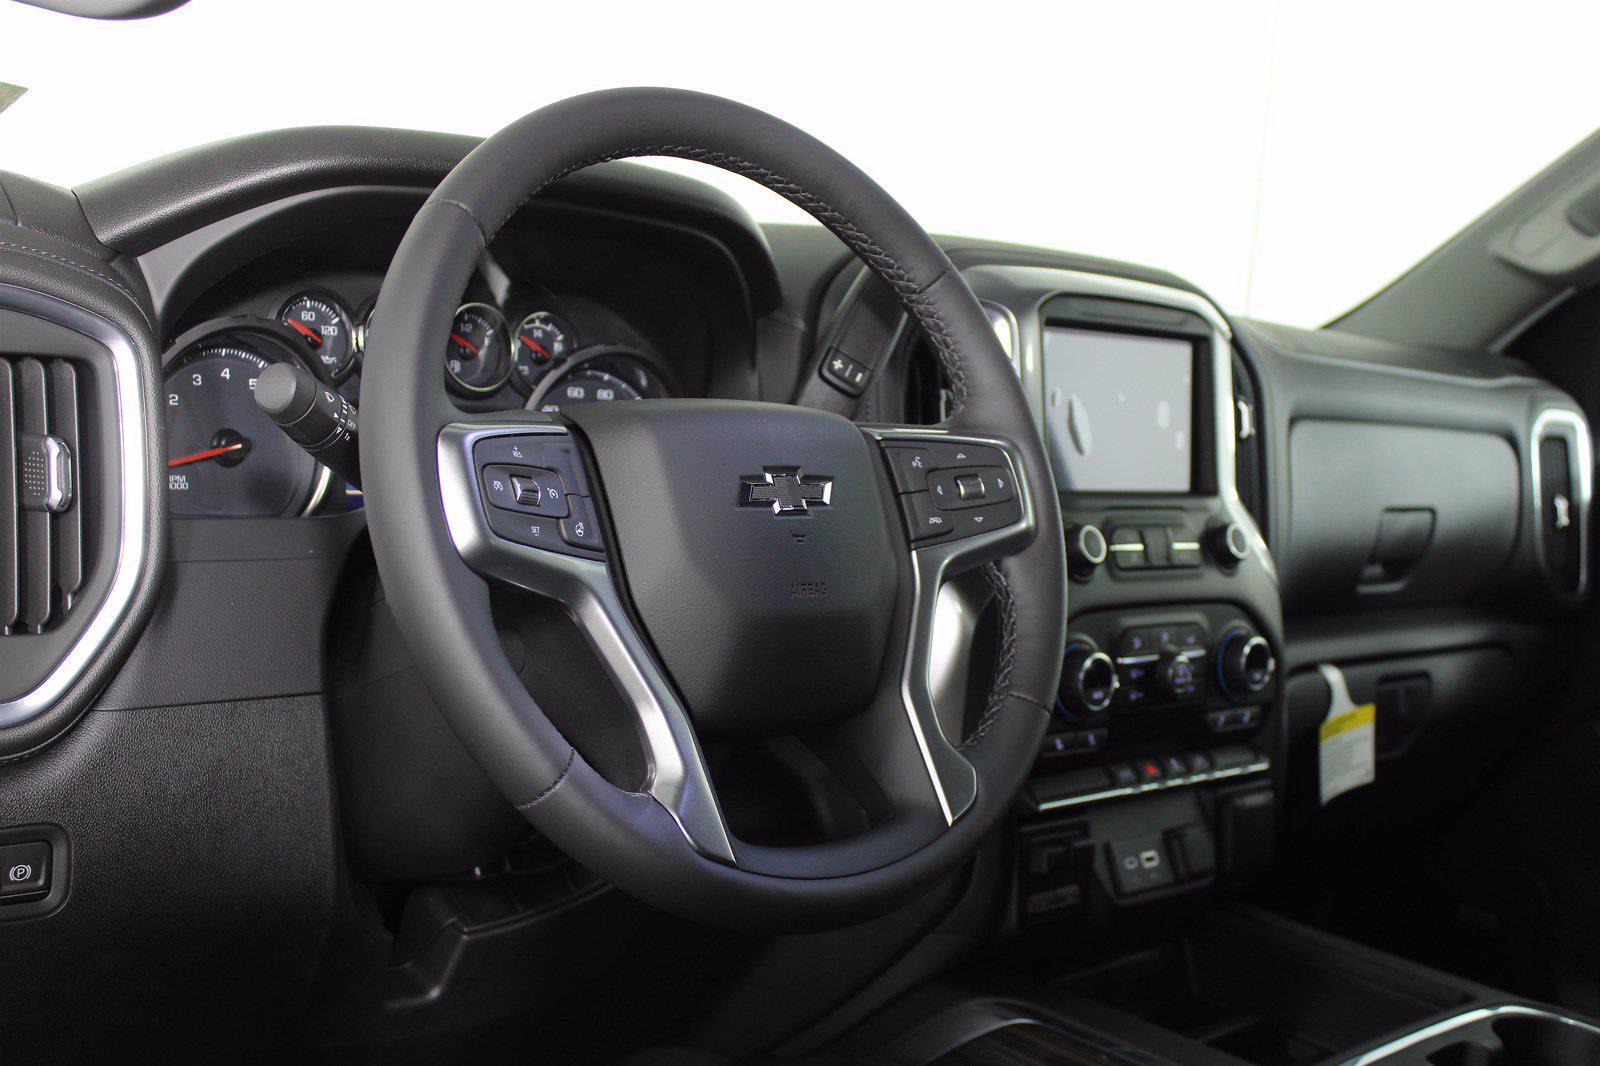 2021 Chevrolet Silverado 1500 Crew Cab 4x4, Pickup #D111073 - photo 10